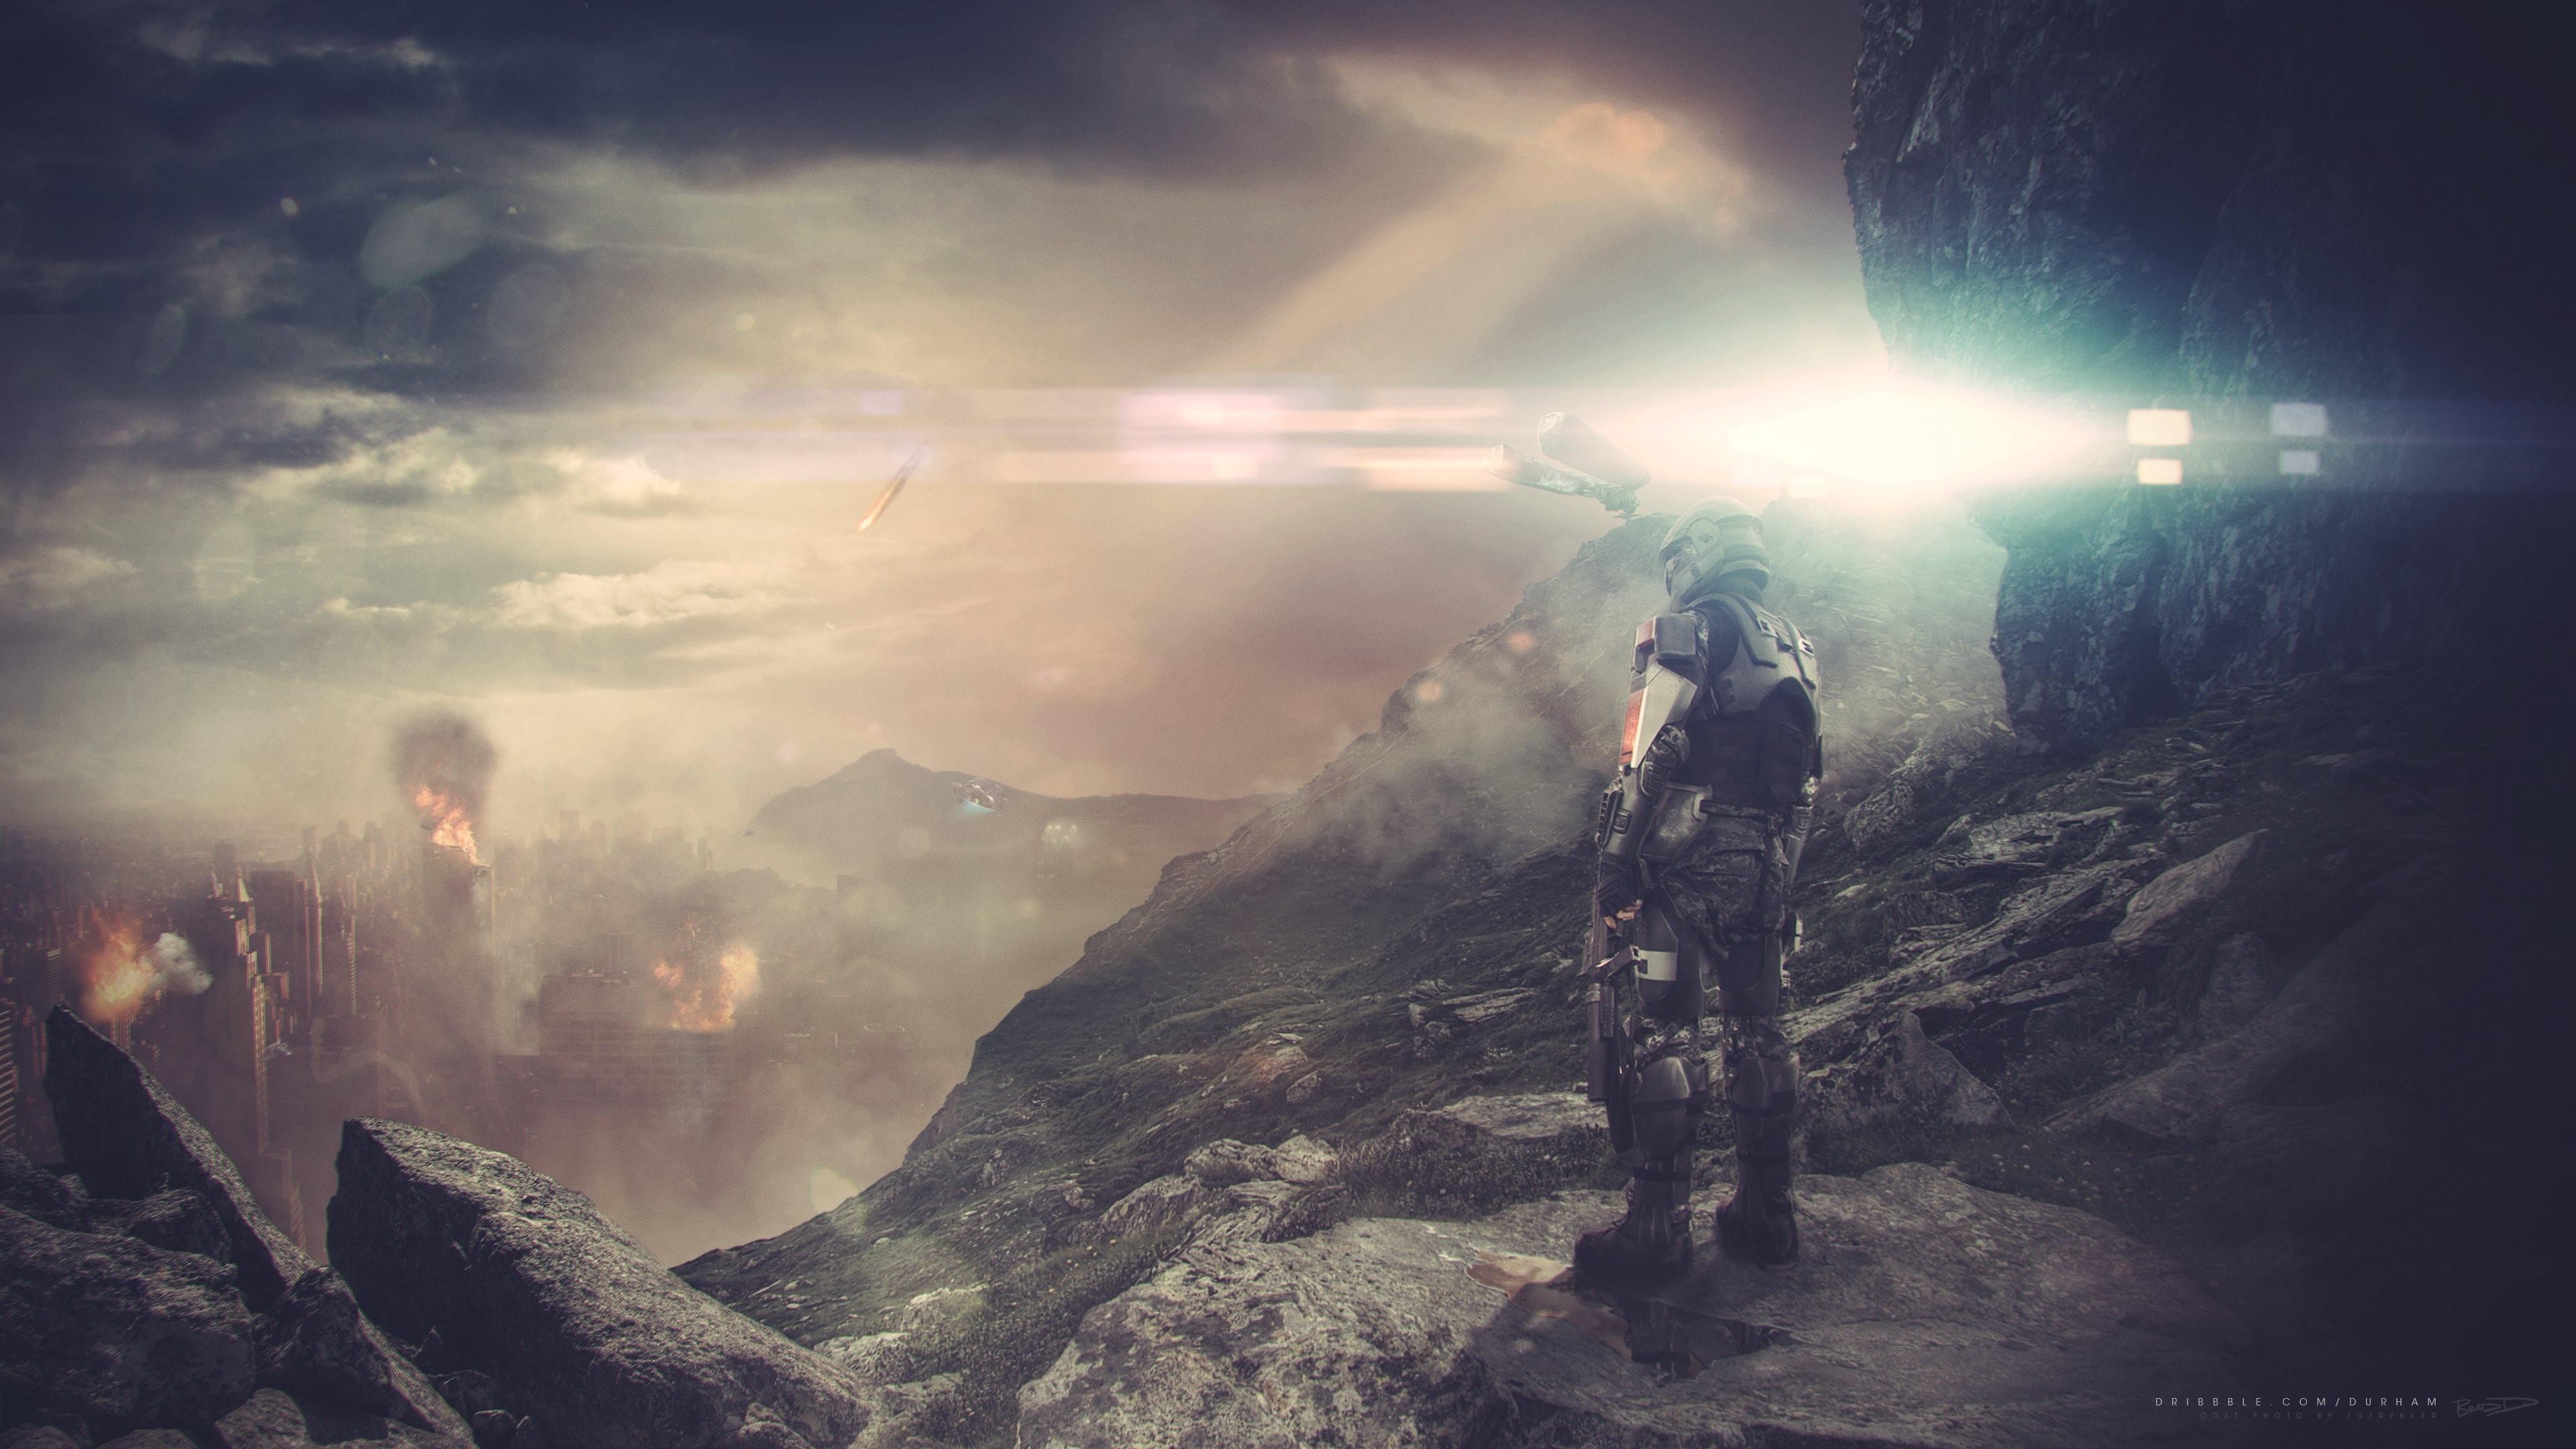 Halo 5 Guardians Artwork Wallpaper